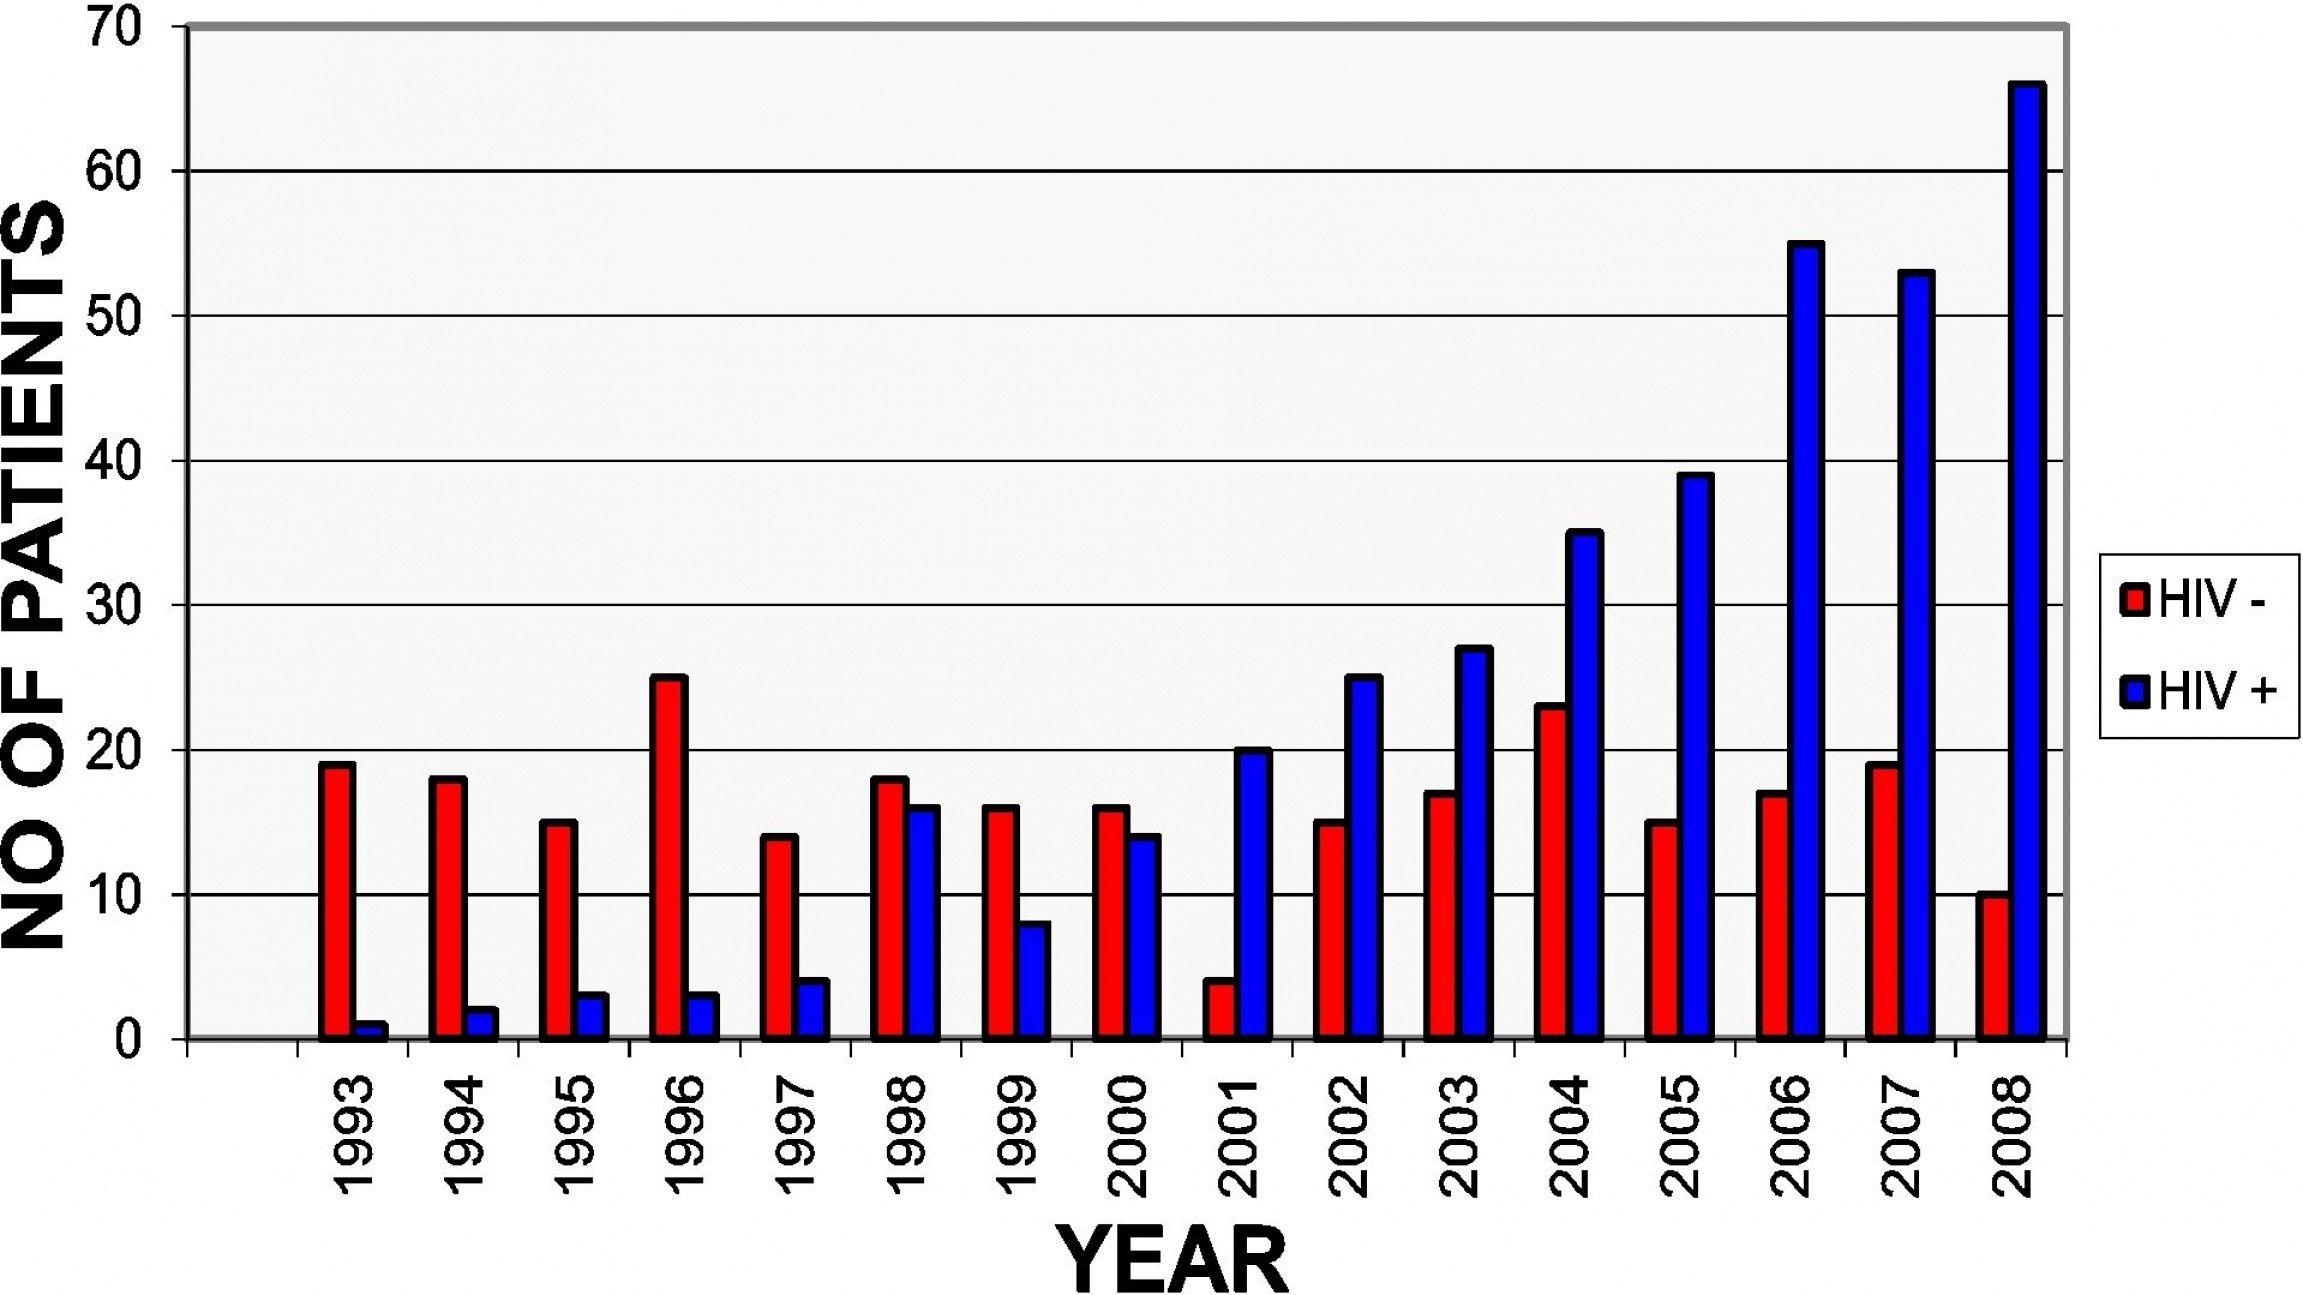 Cancer non hodgkin s lymphoma survival rate - Cancer non hodgkins lymphoma survival rate